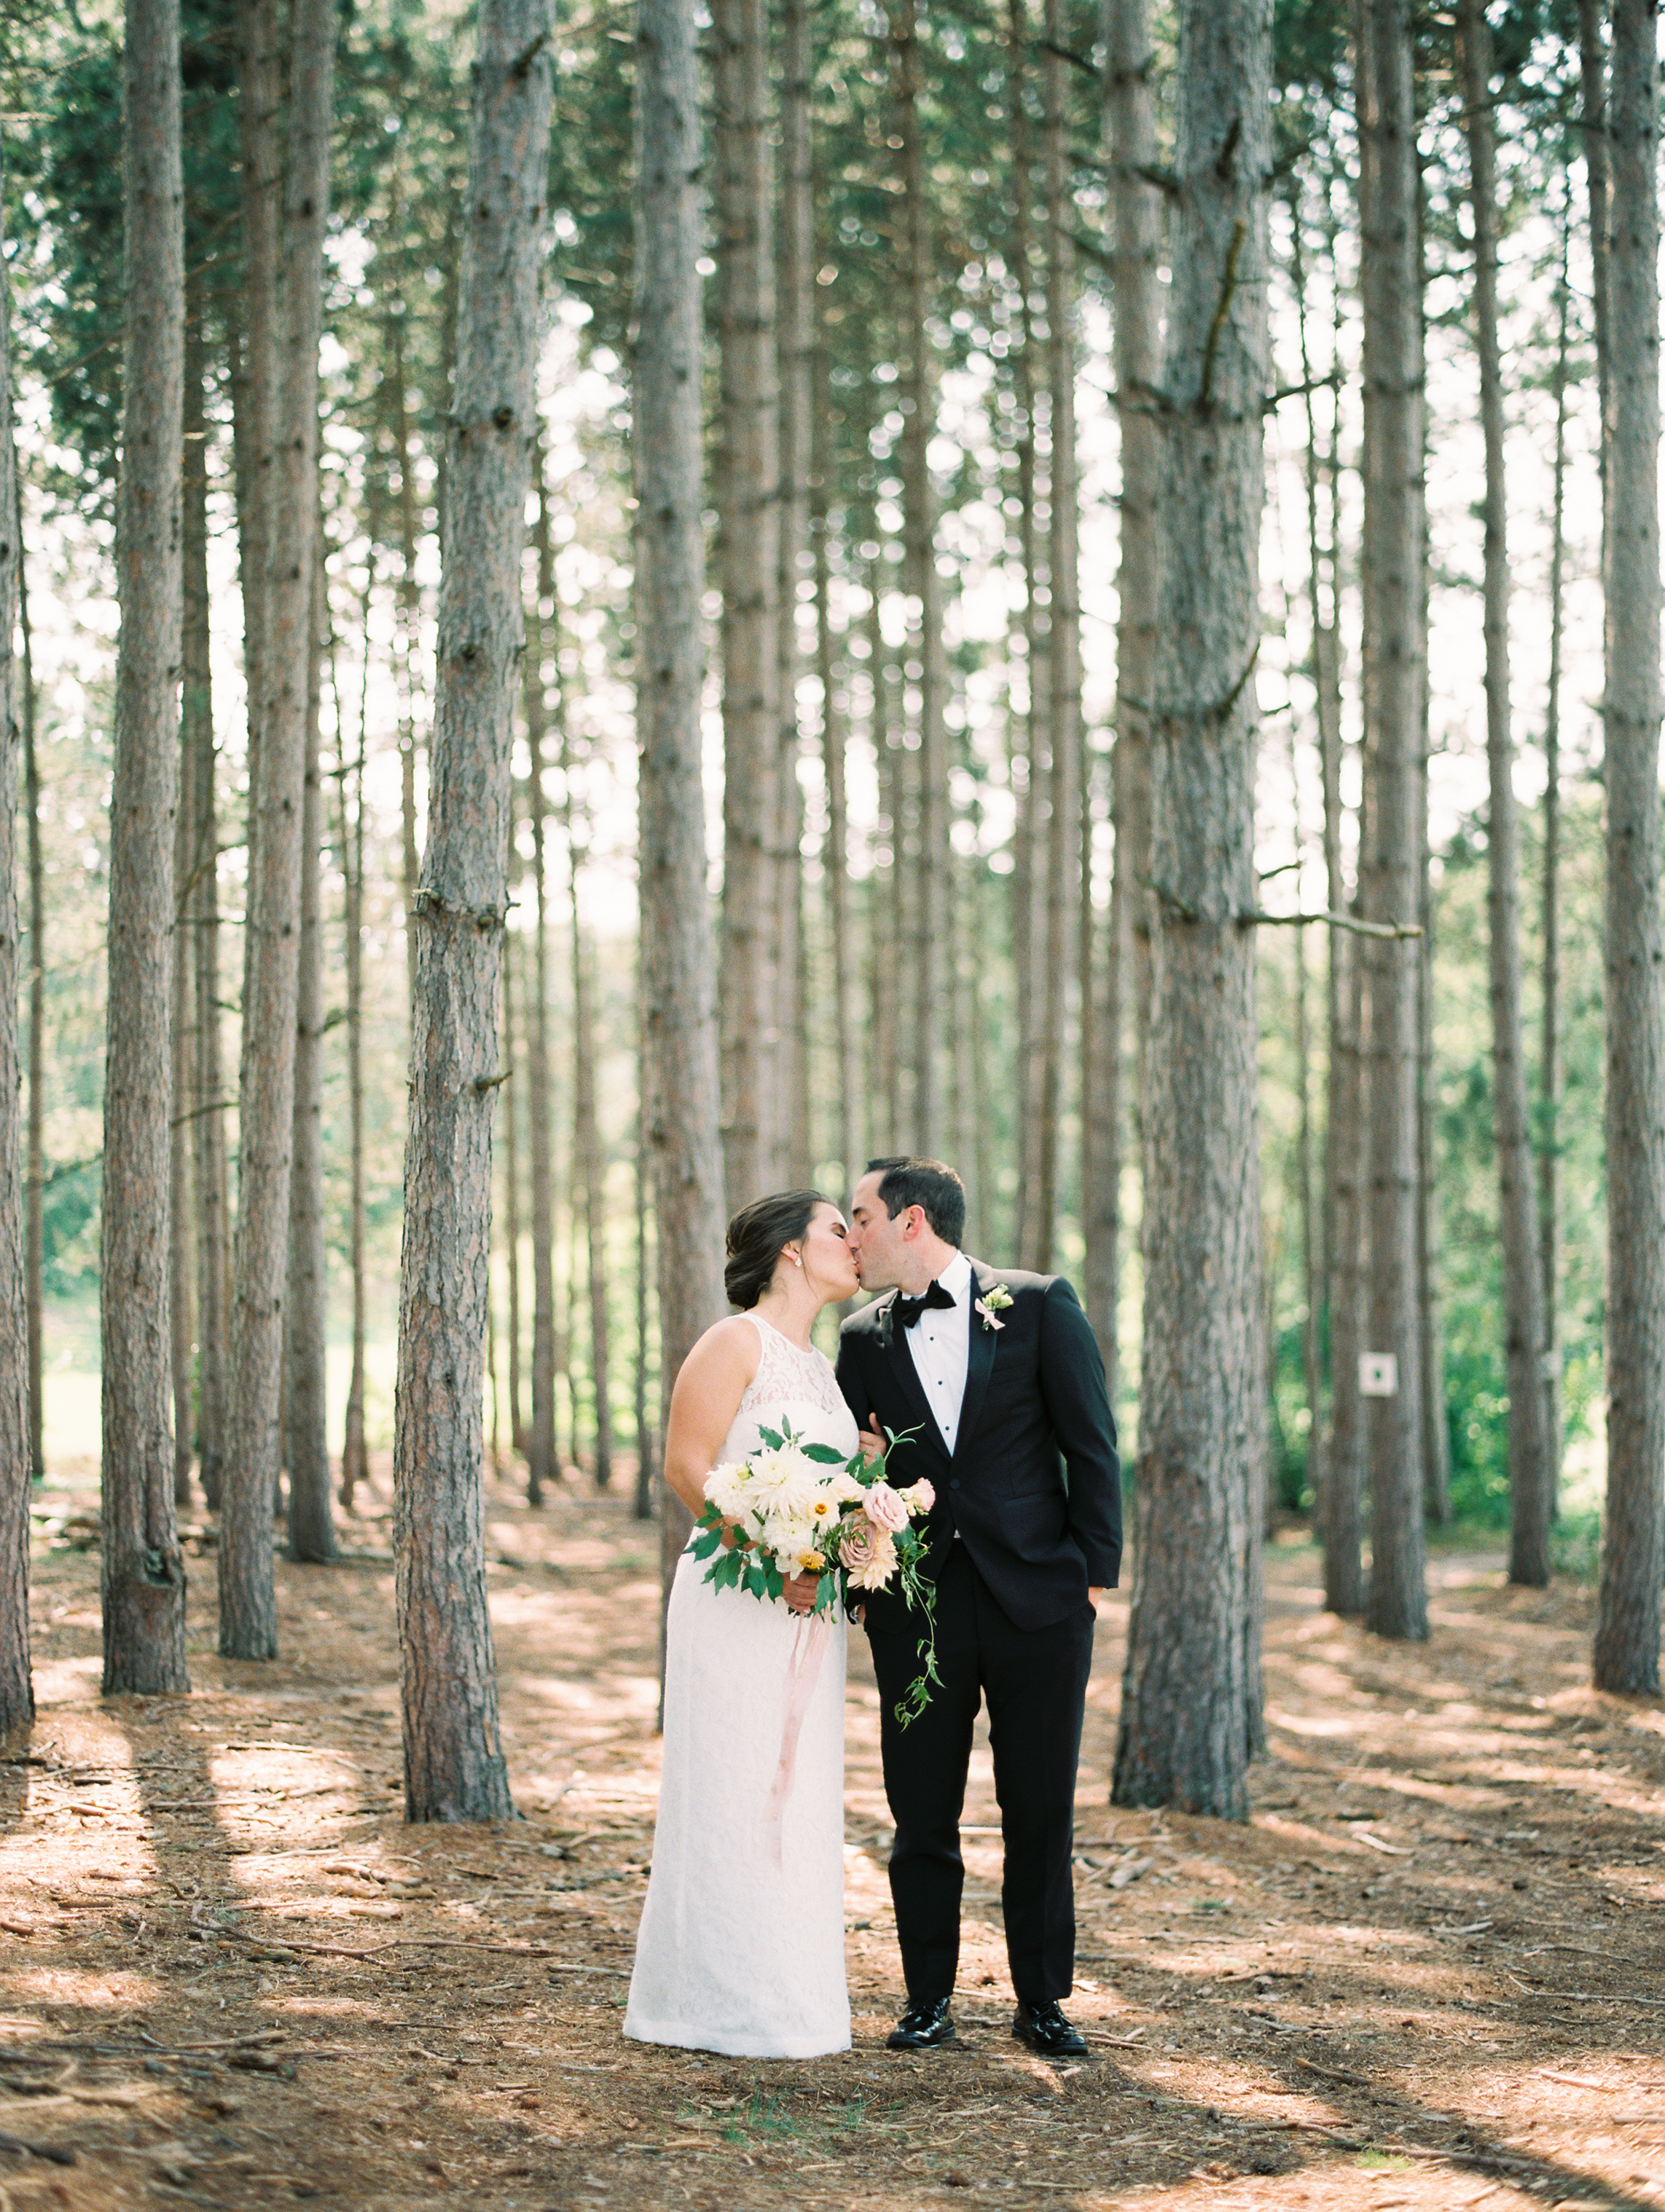 Zoller+Wedding+Bridal+Partyf-65.jpg